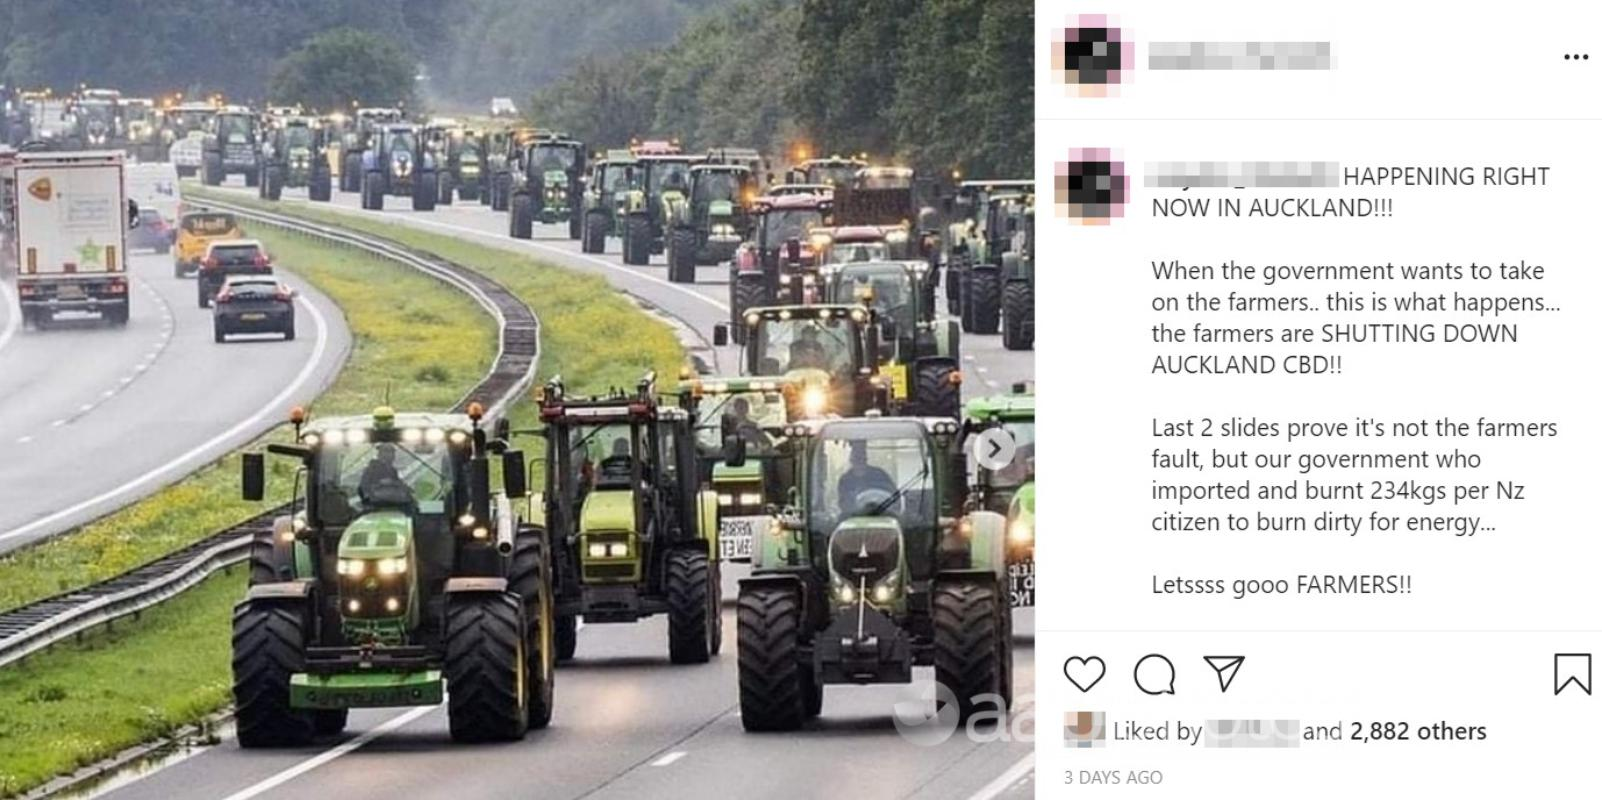 The Instagram post